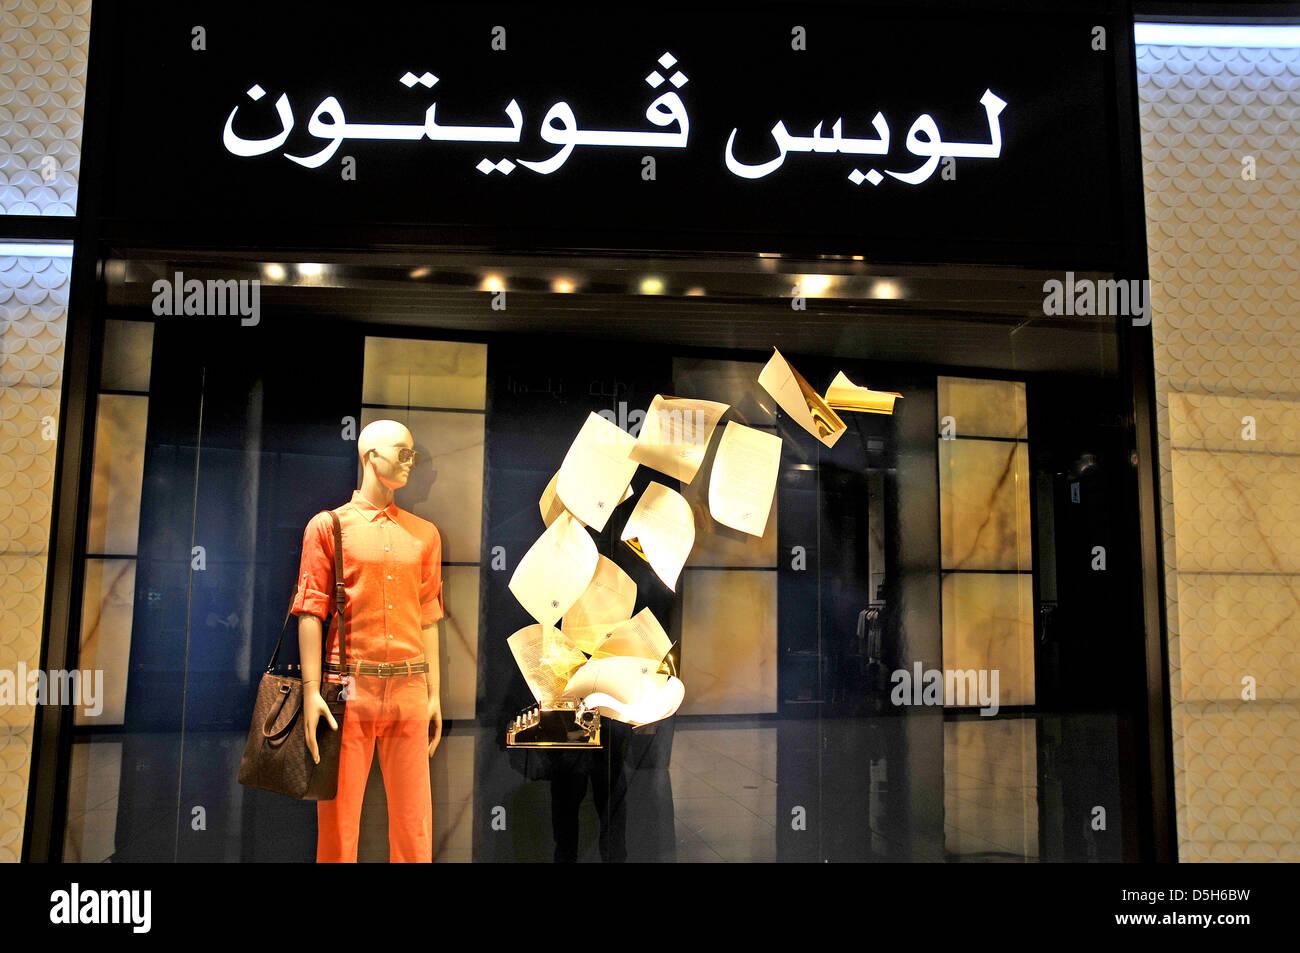 b13ace58ac Louis Vuitton boutique centro commerciale Dubai Dubai EMIRATI ARABI UNITI  Immagini Stock